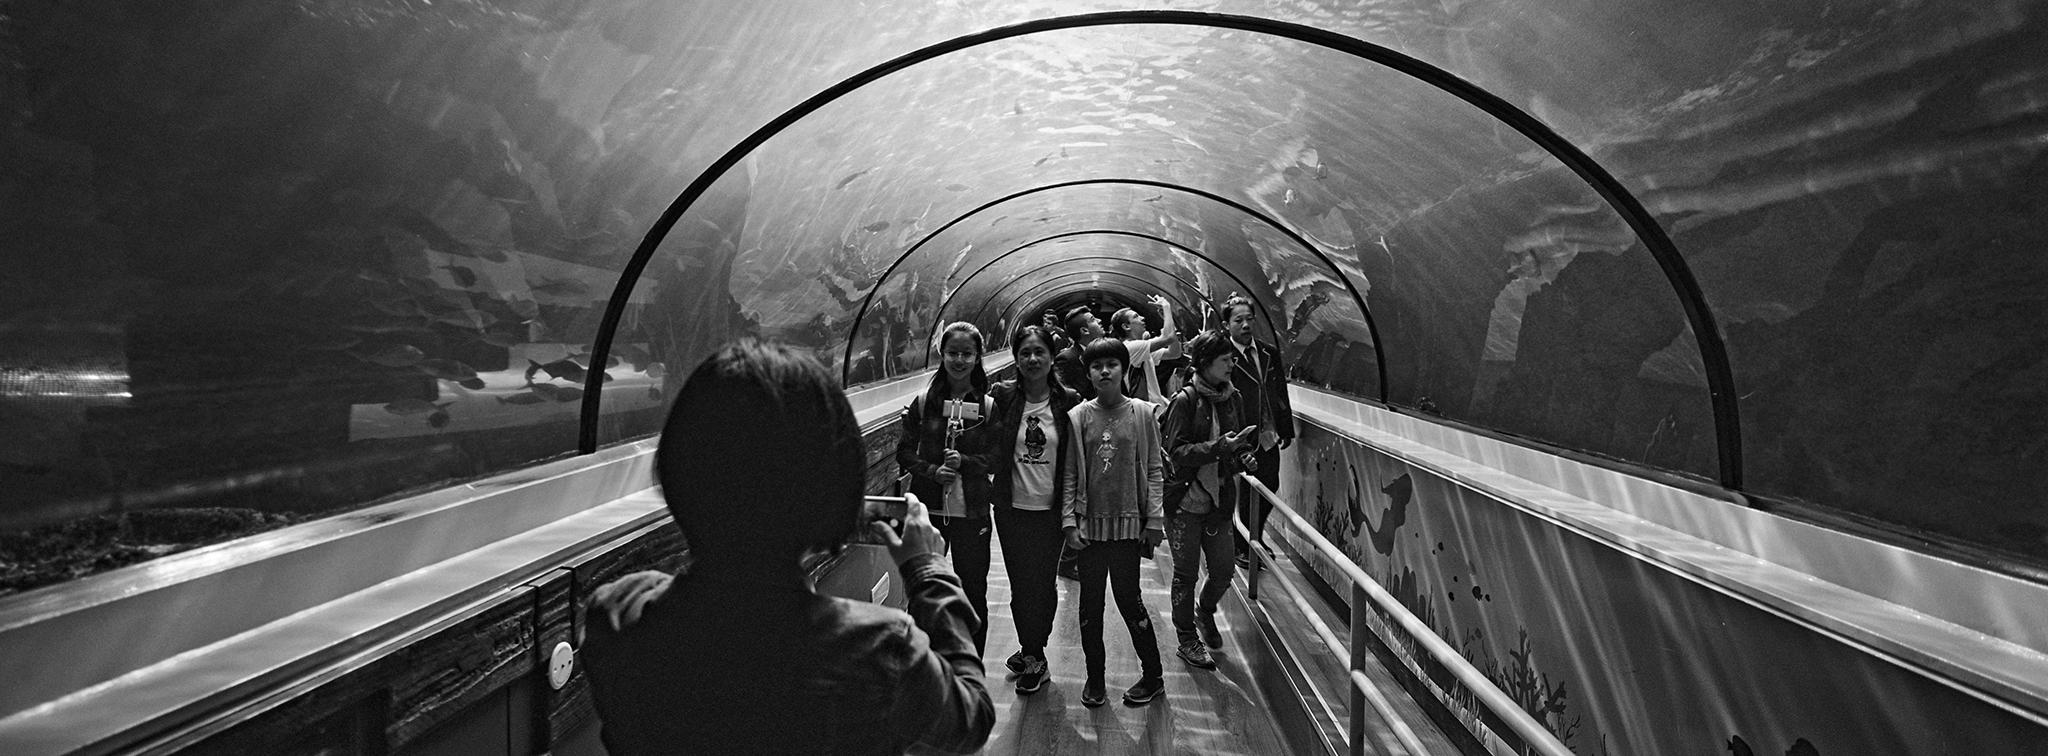 Sydney Aquarium v